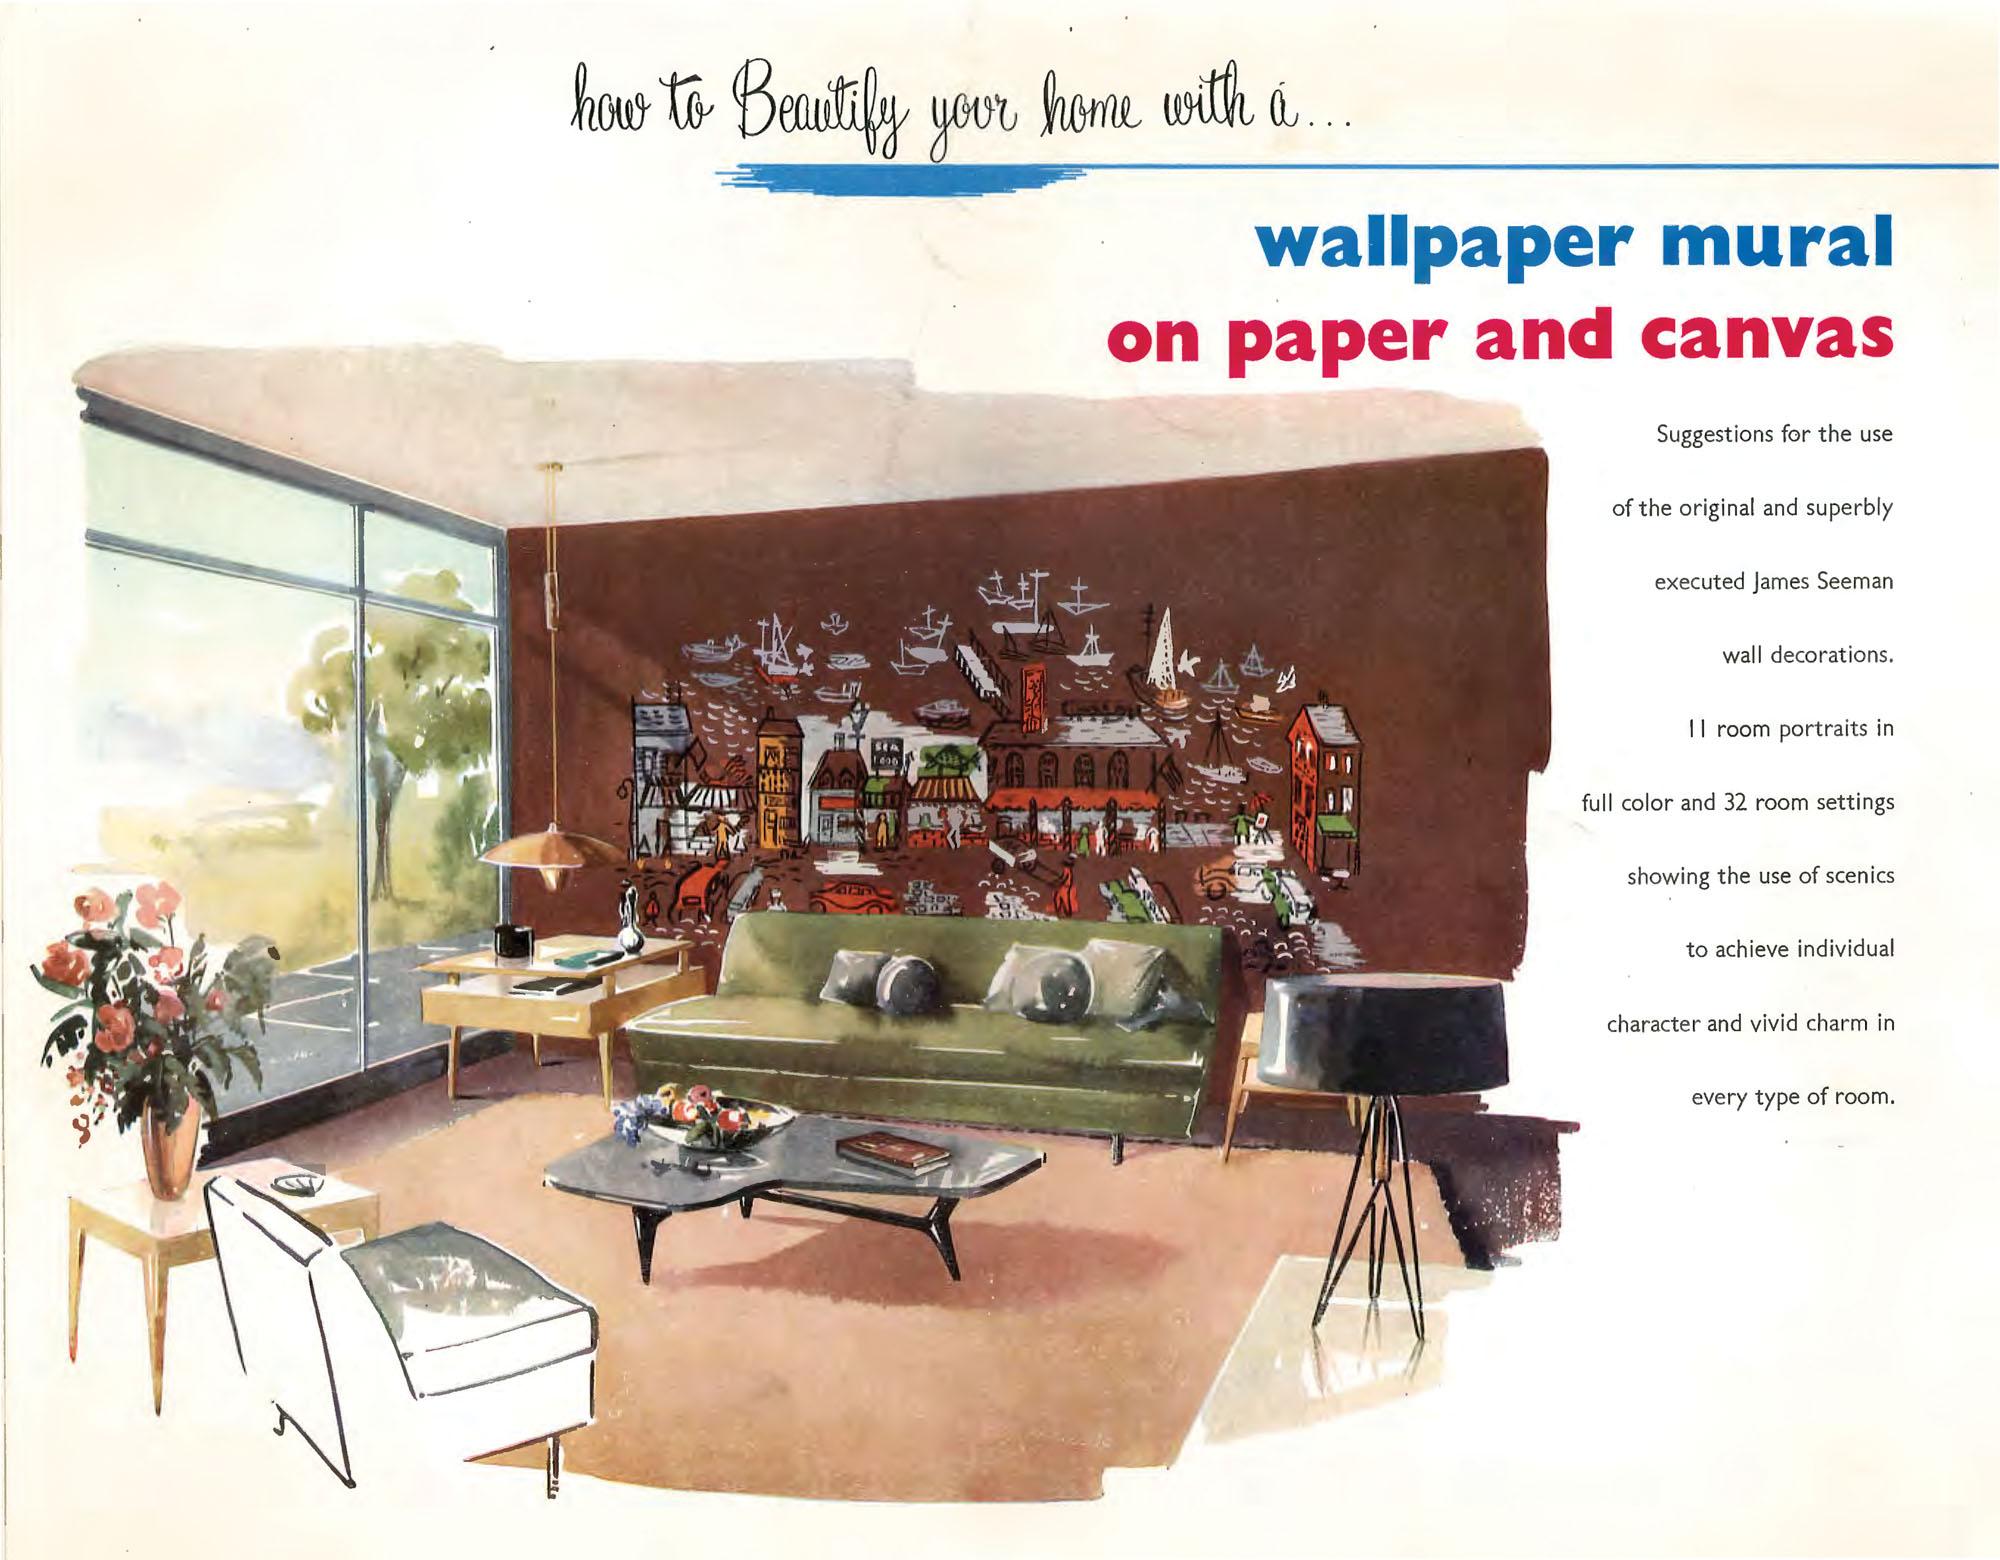 1960s James Seeman Mural Savage_gn